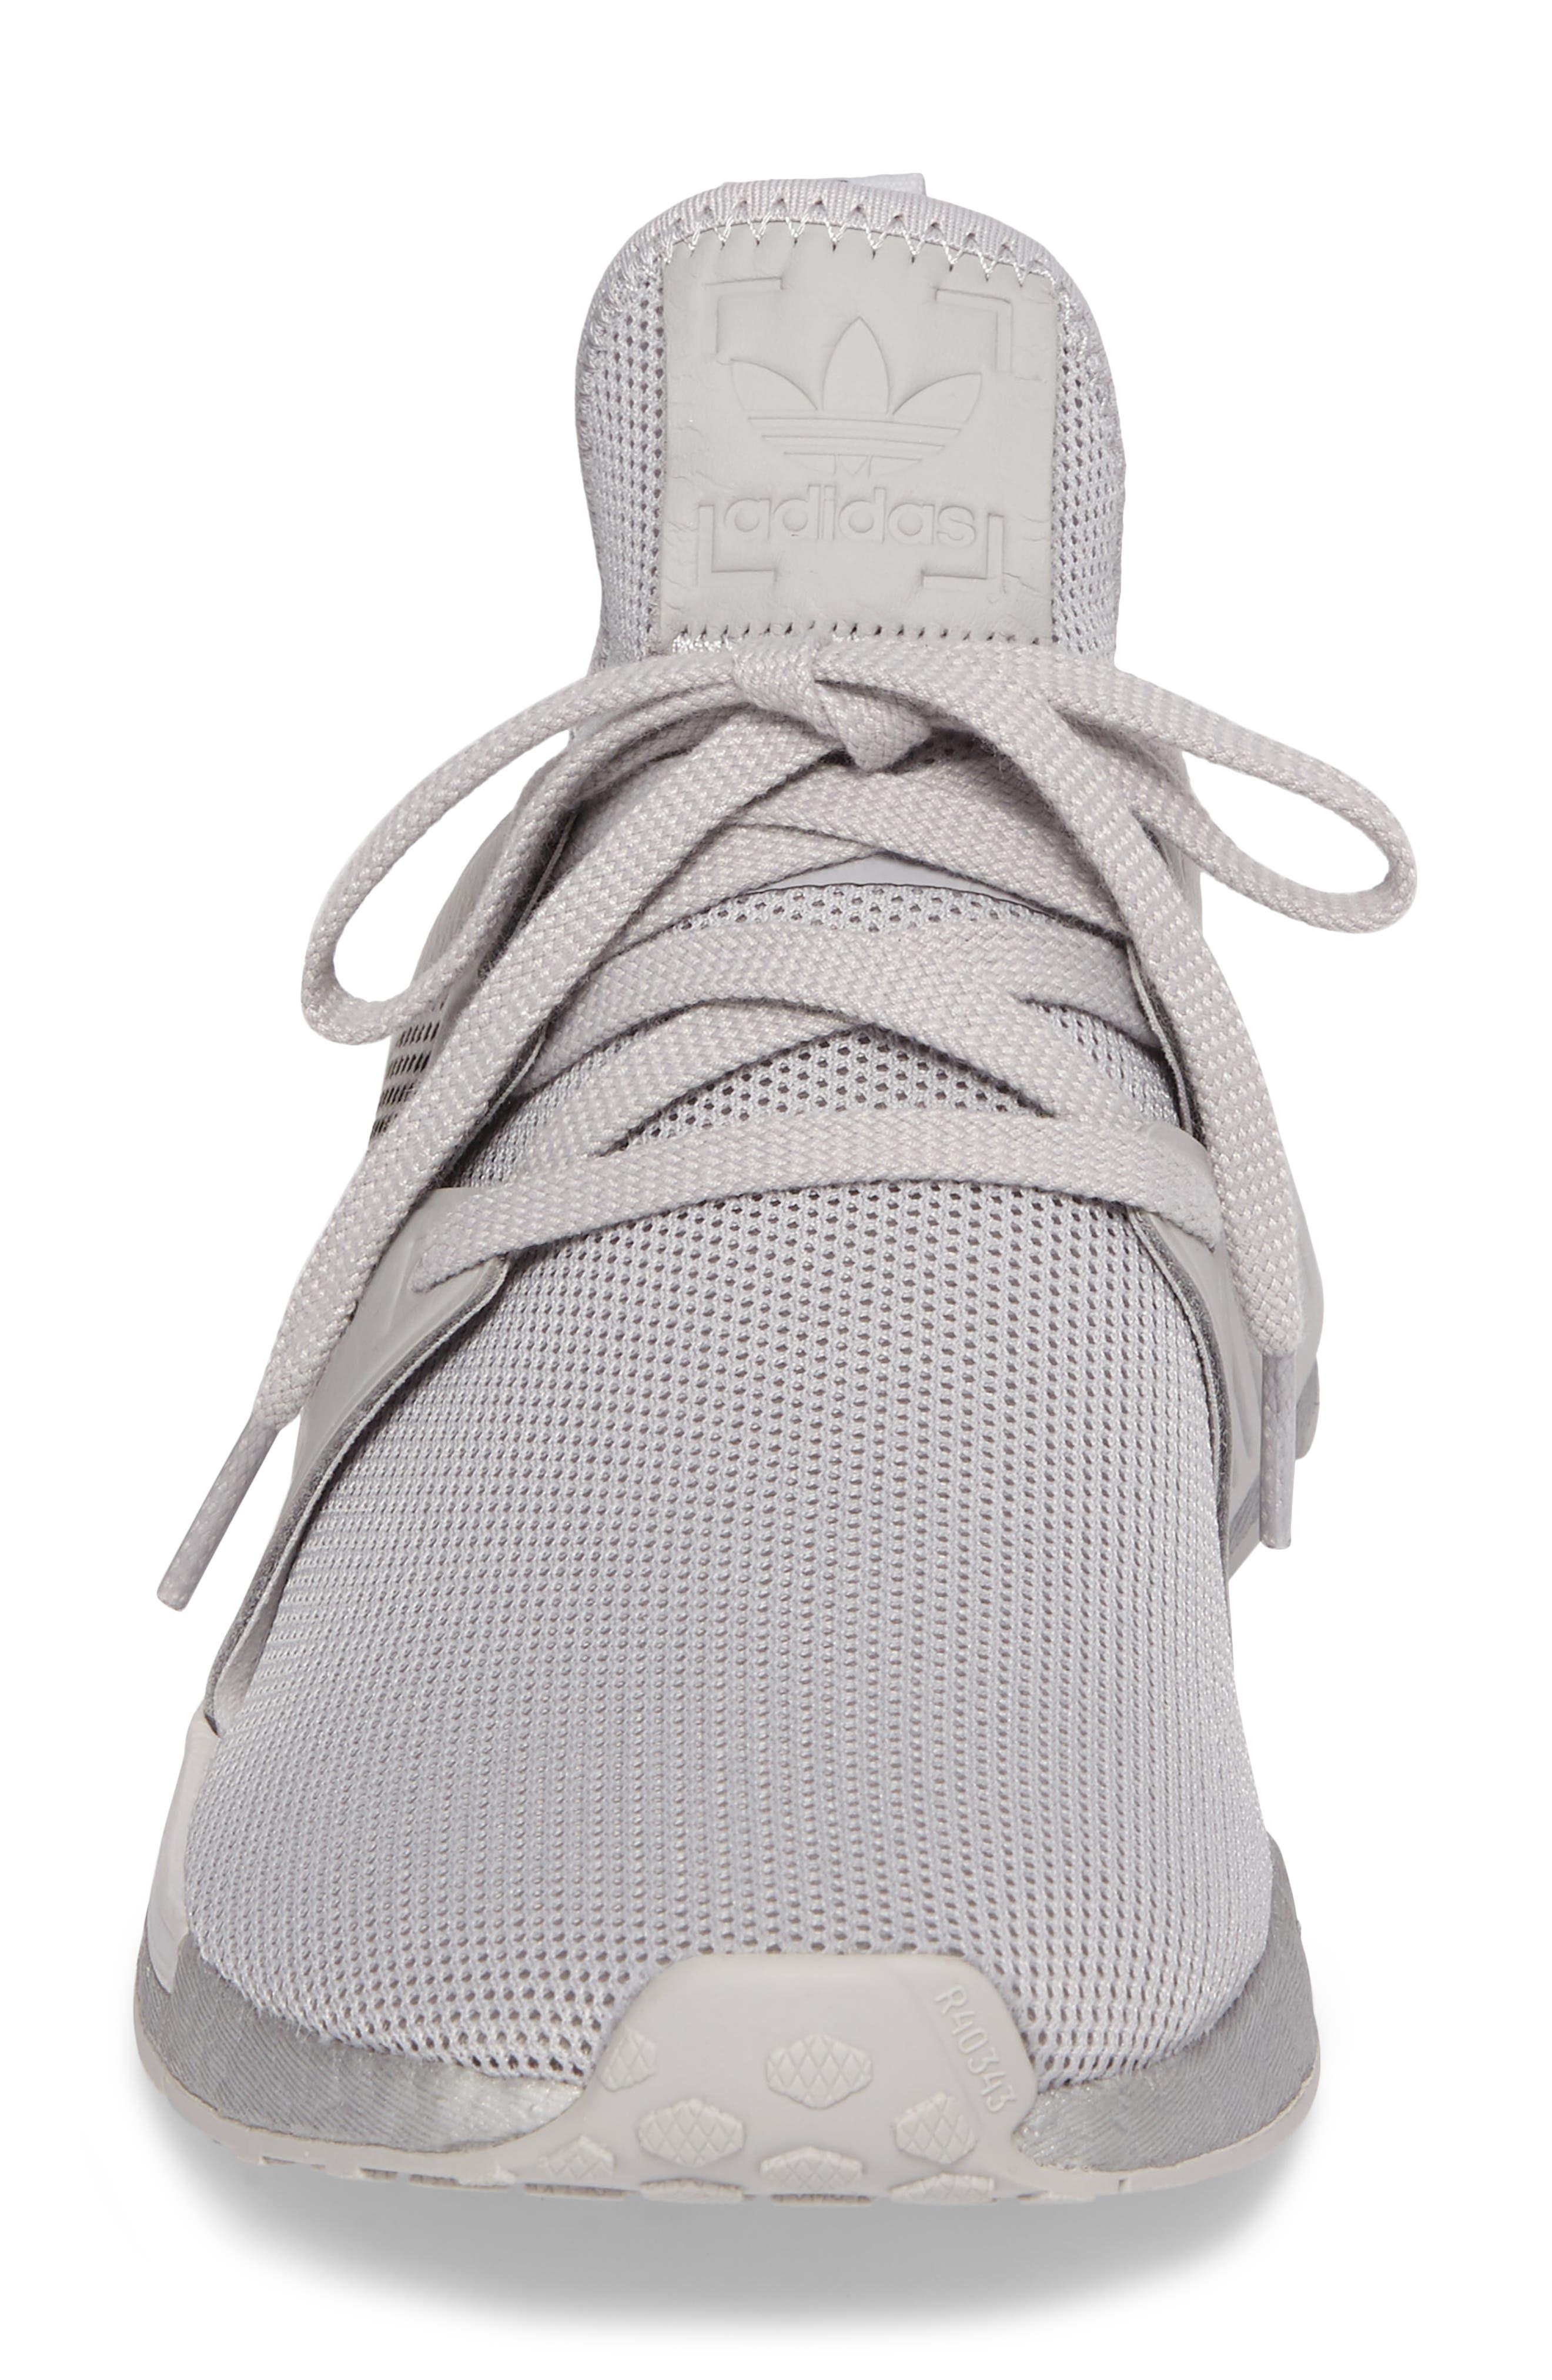 NMD XR1 Sneaker,                             Alternate thumbnail 4, color,                             020